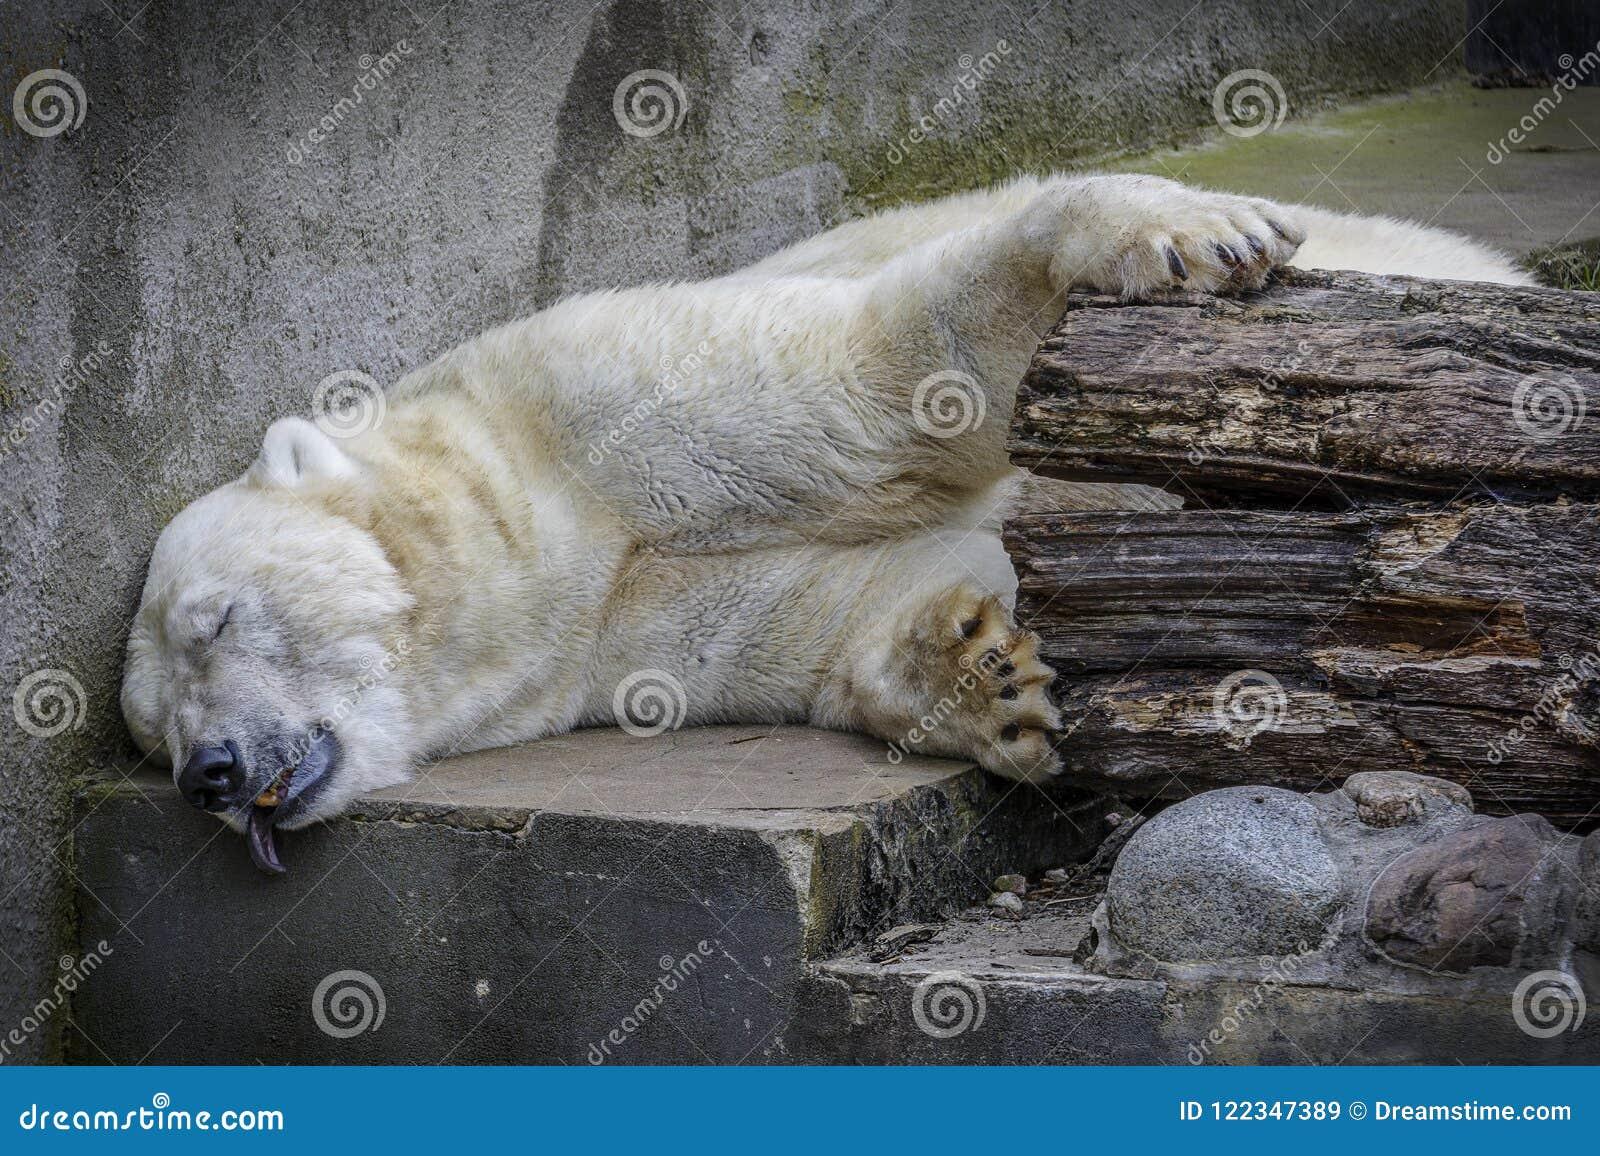 White Bear sleep in not his habitat